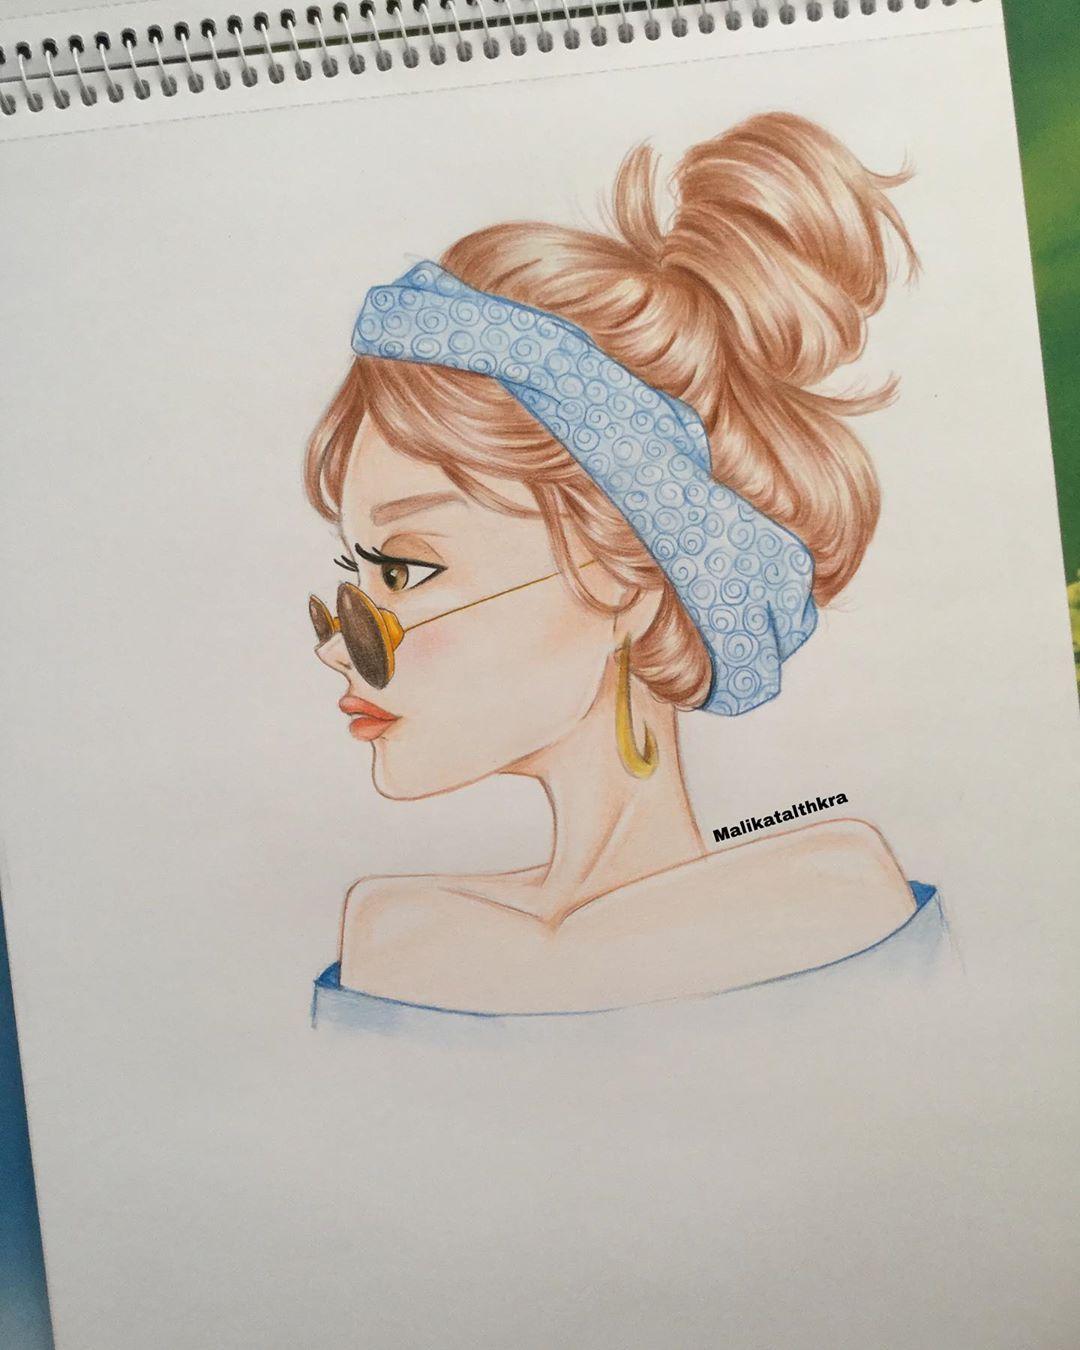 سبيستون صباح الخير Cool رسوم شتاء كارتون كيوت انمي رسمتي رسم رسمه فتاه مطر Girl Drawing Sketches Art Painting Acrylic Detective Conan Wallpapers